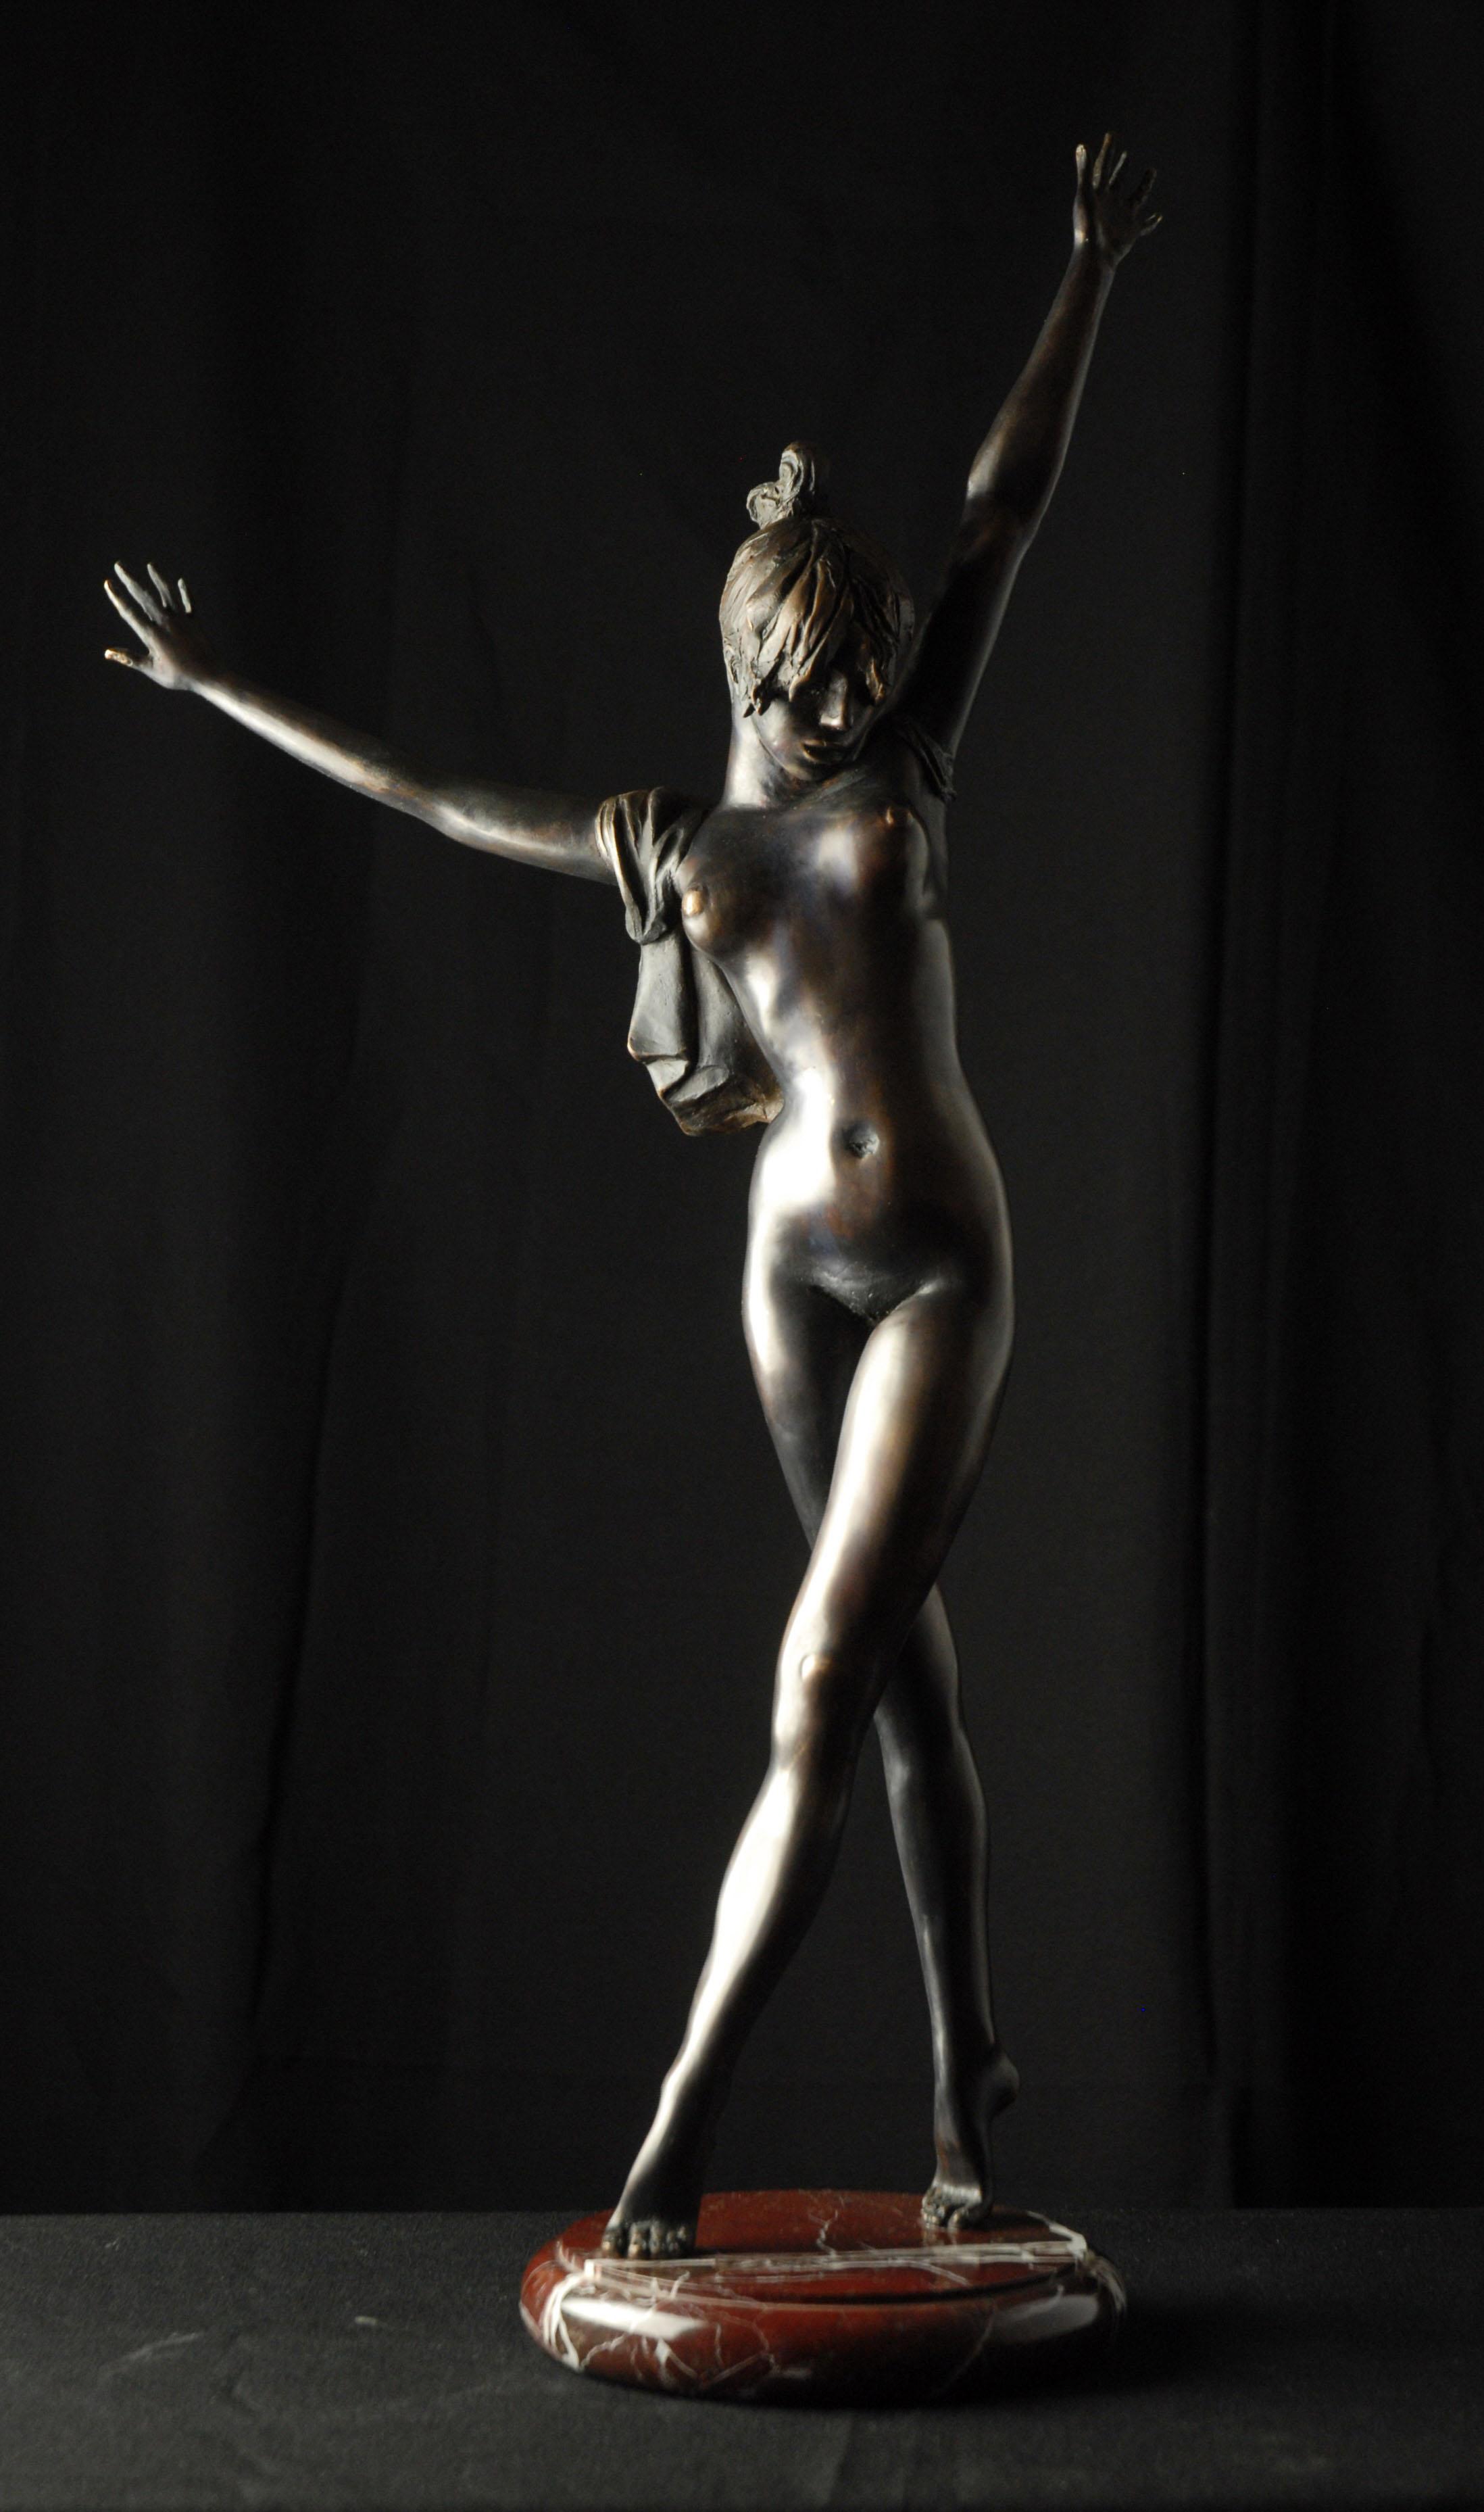 Серафим Чаркин, «Танцовщица», бронза, 2001 год.